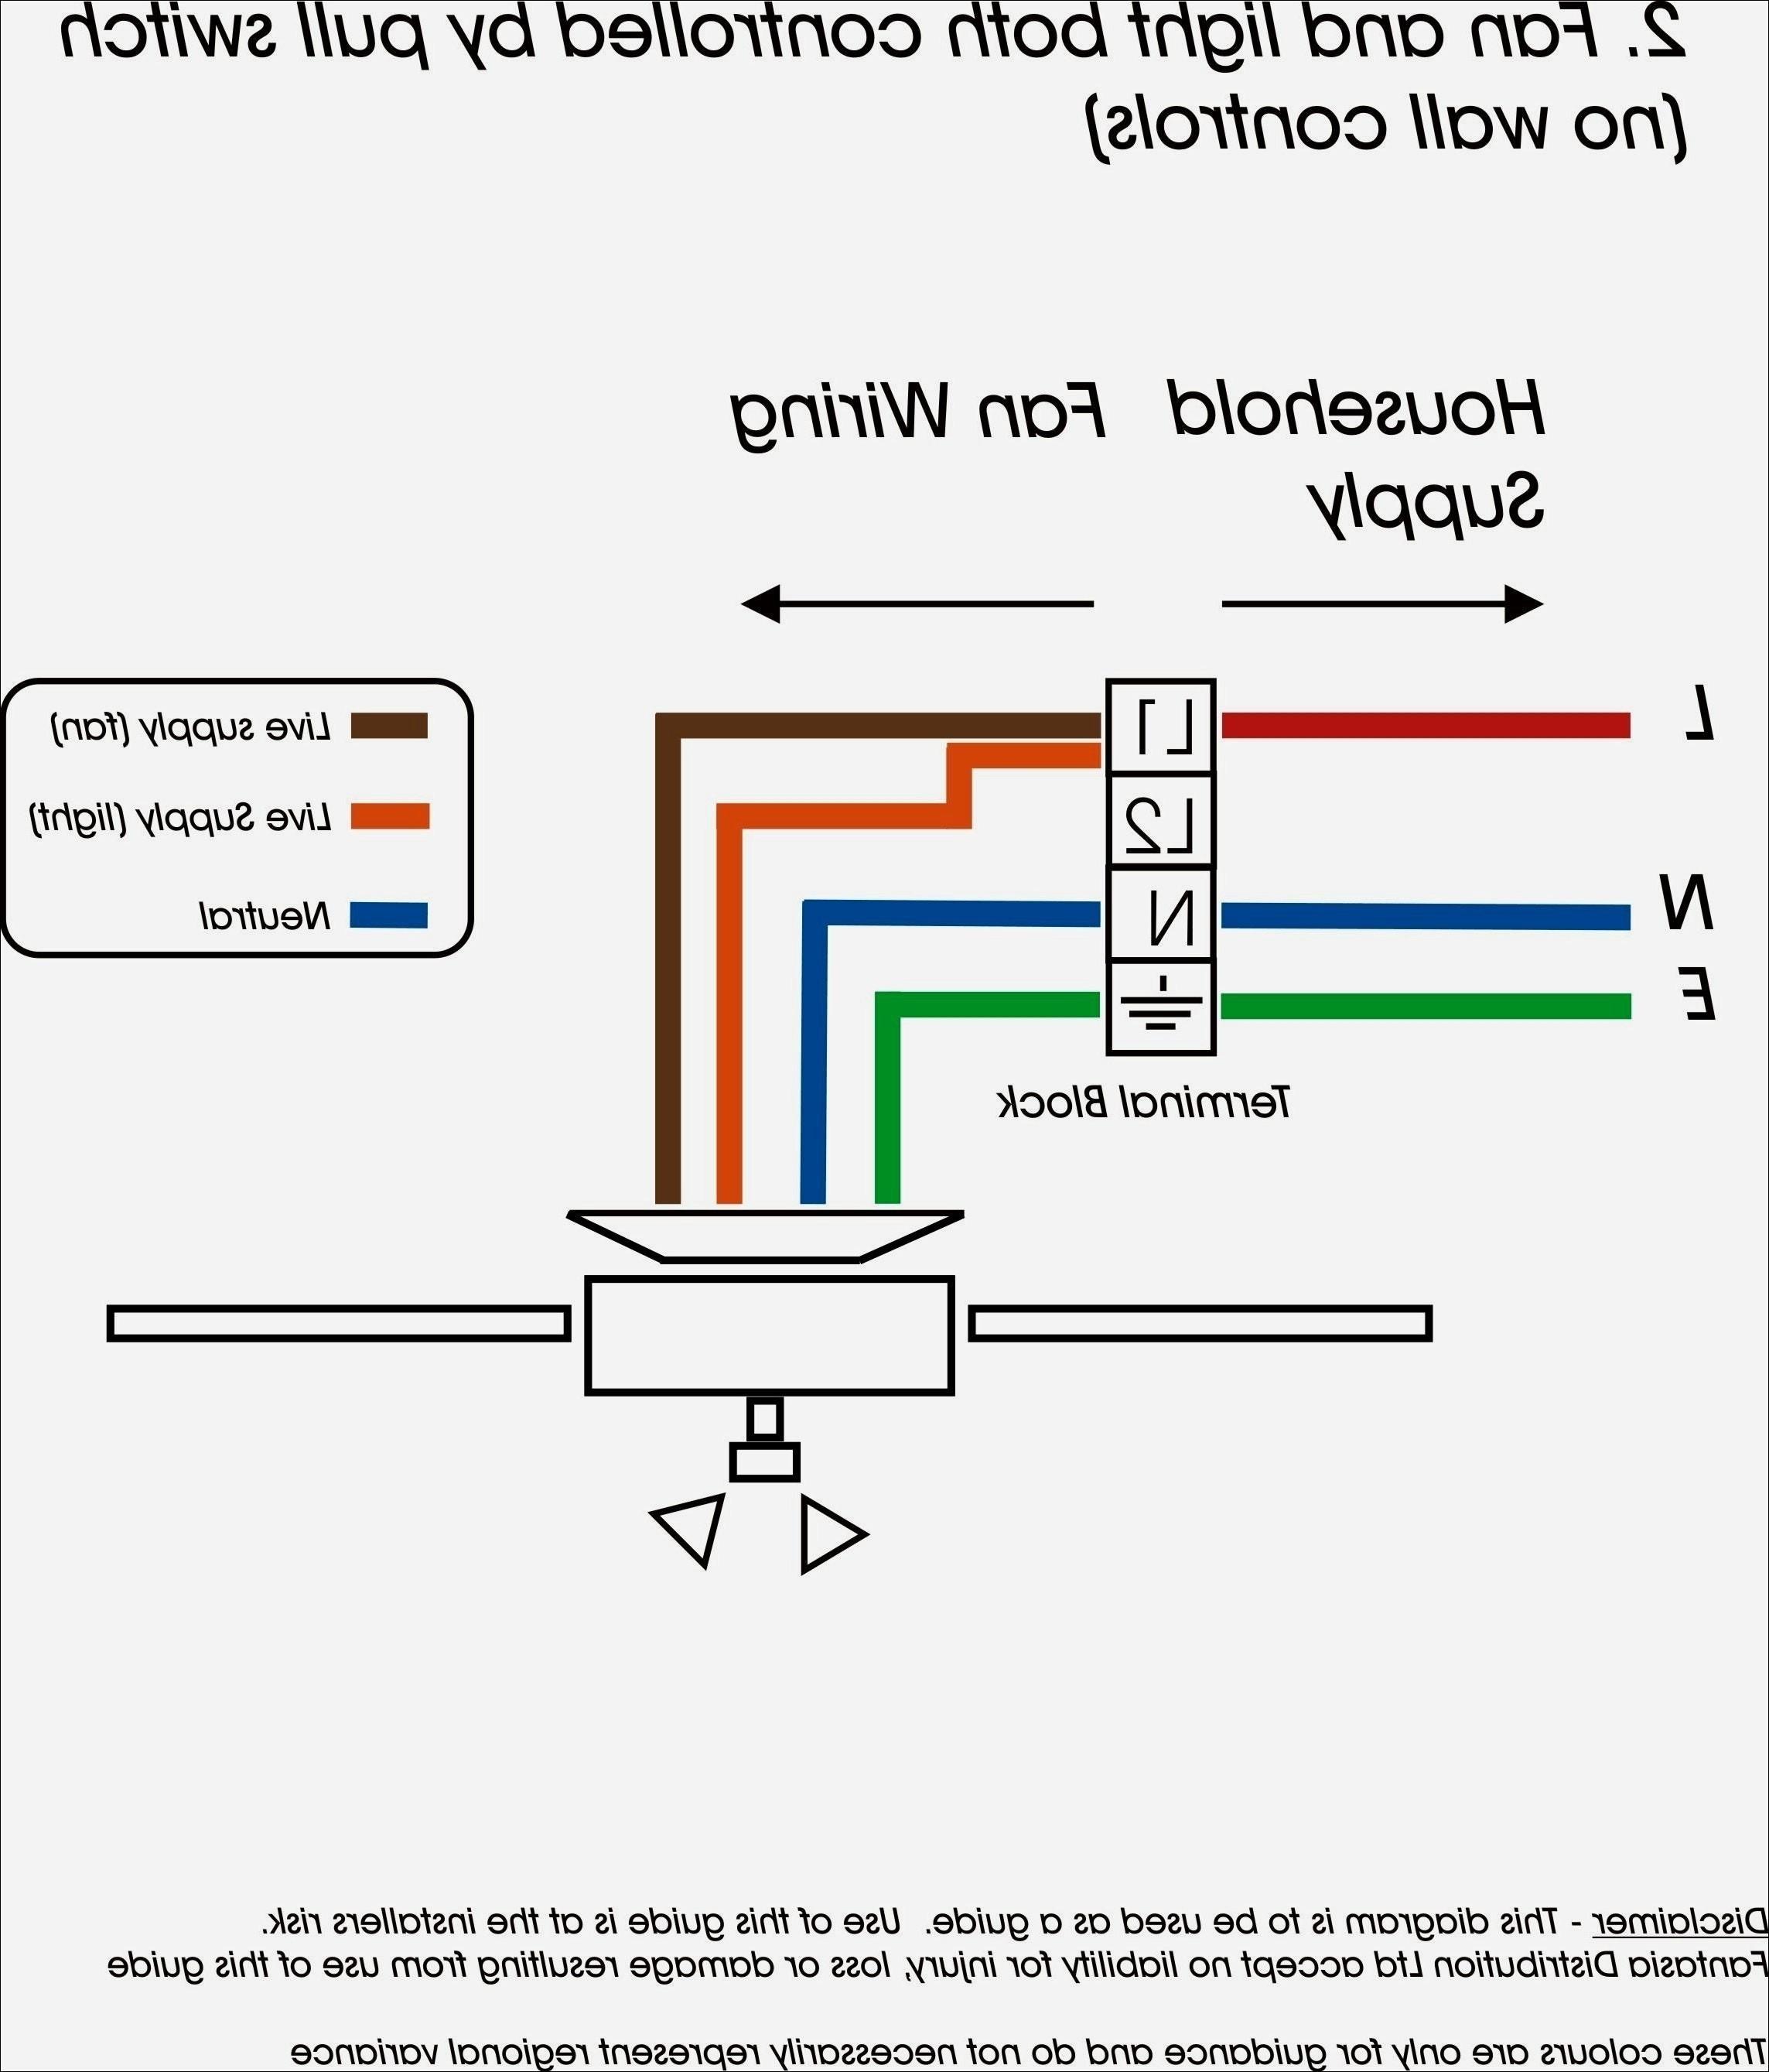 gibson firebird wiring diagram Download-basic bathroom wiring diagram Download Wiring Diagram Bathroom Extractor Fan New Wiring Diagram for Extractor 3-m